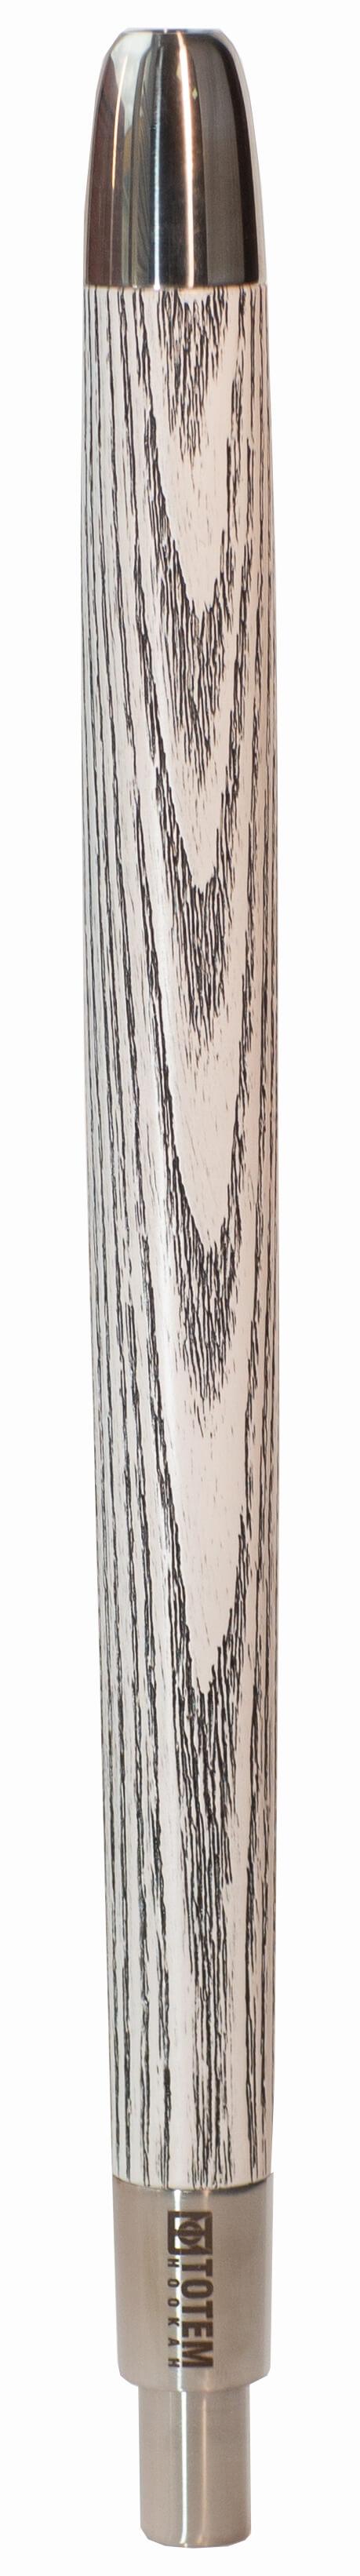 Мундштук для Кальяну Totem Bullet Brushed Traditional